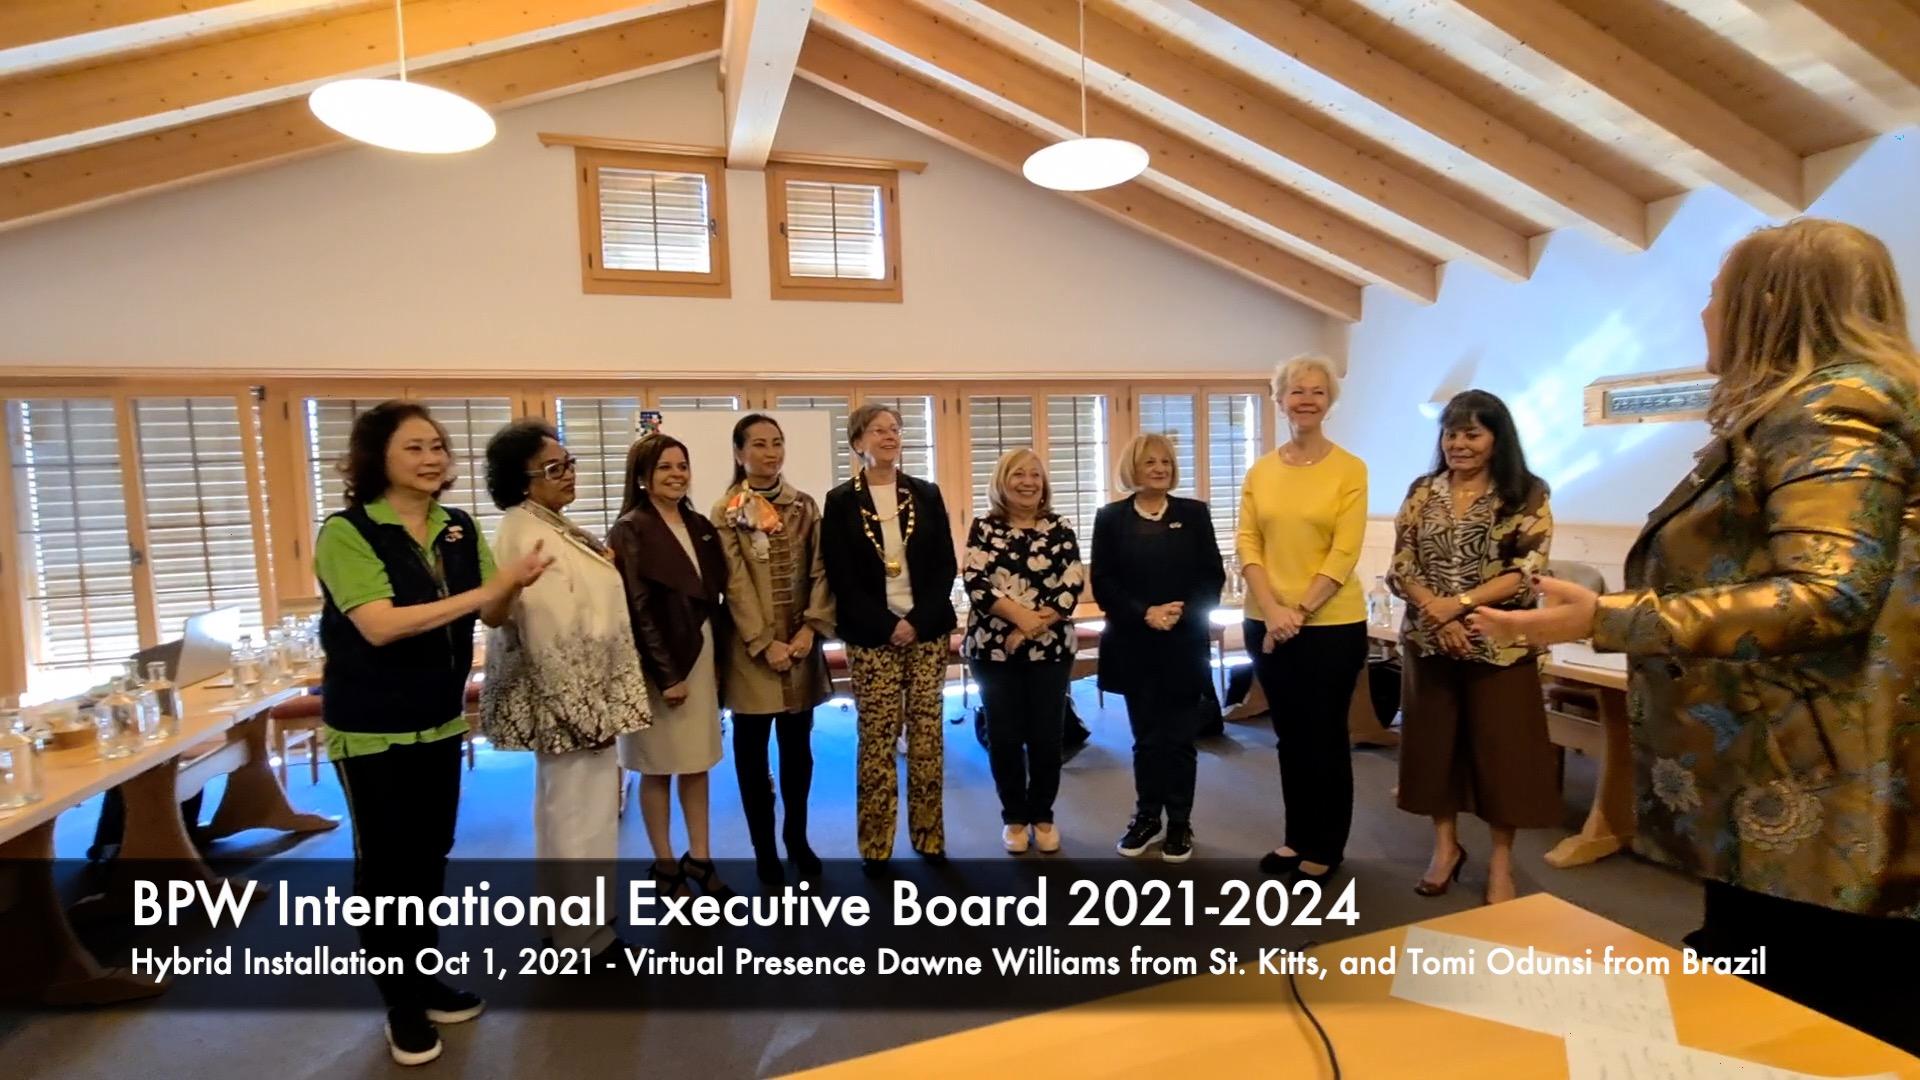 Installation of BPW International Executive Board 2021-2024